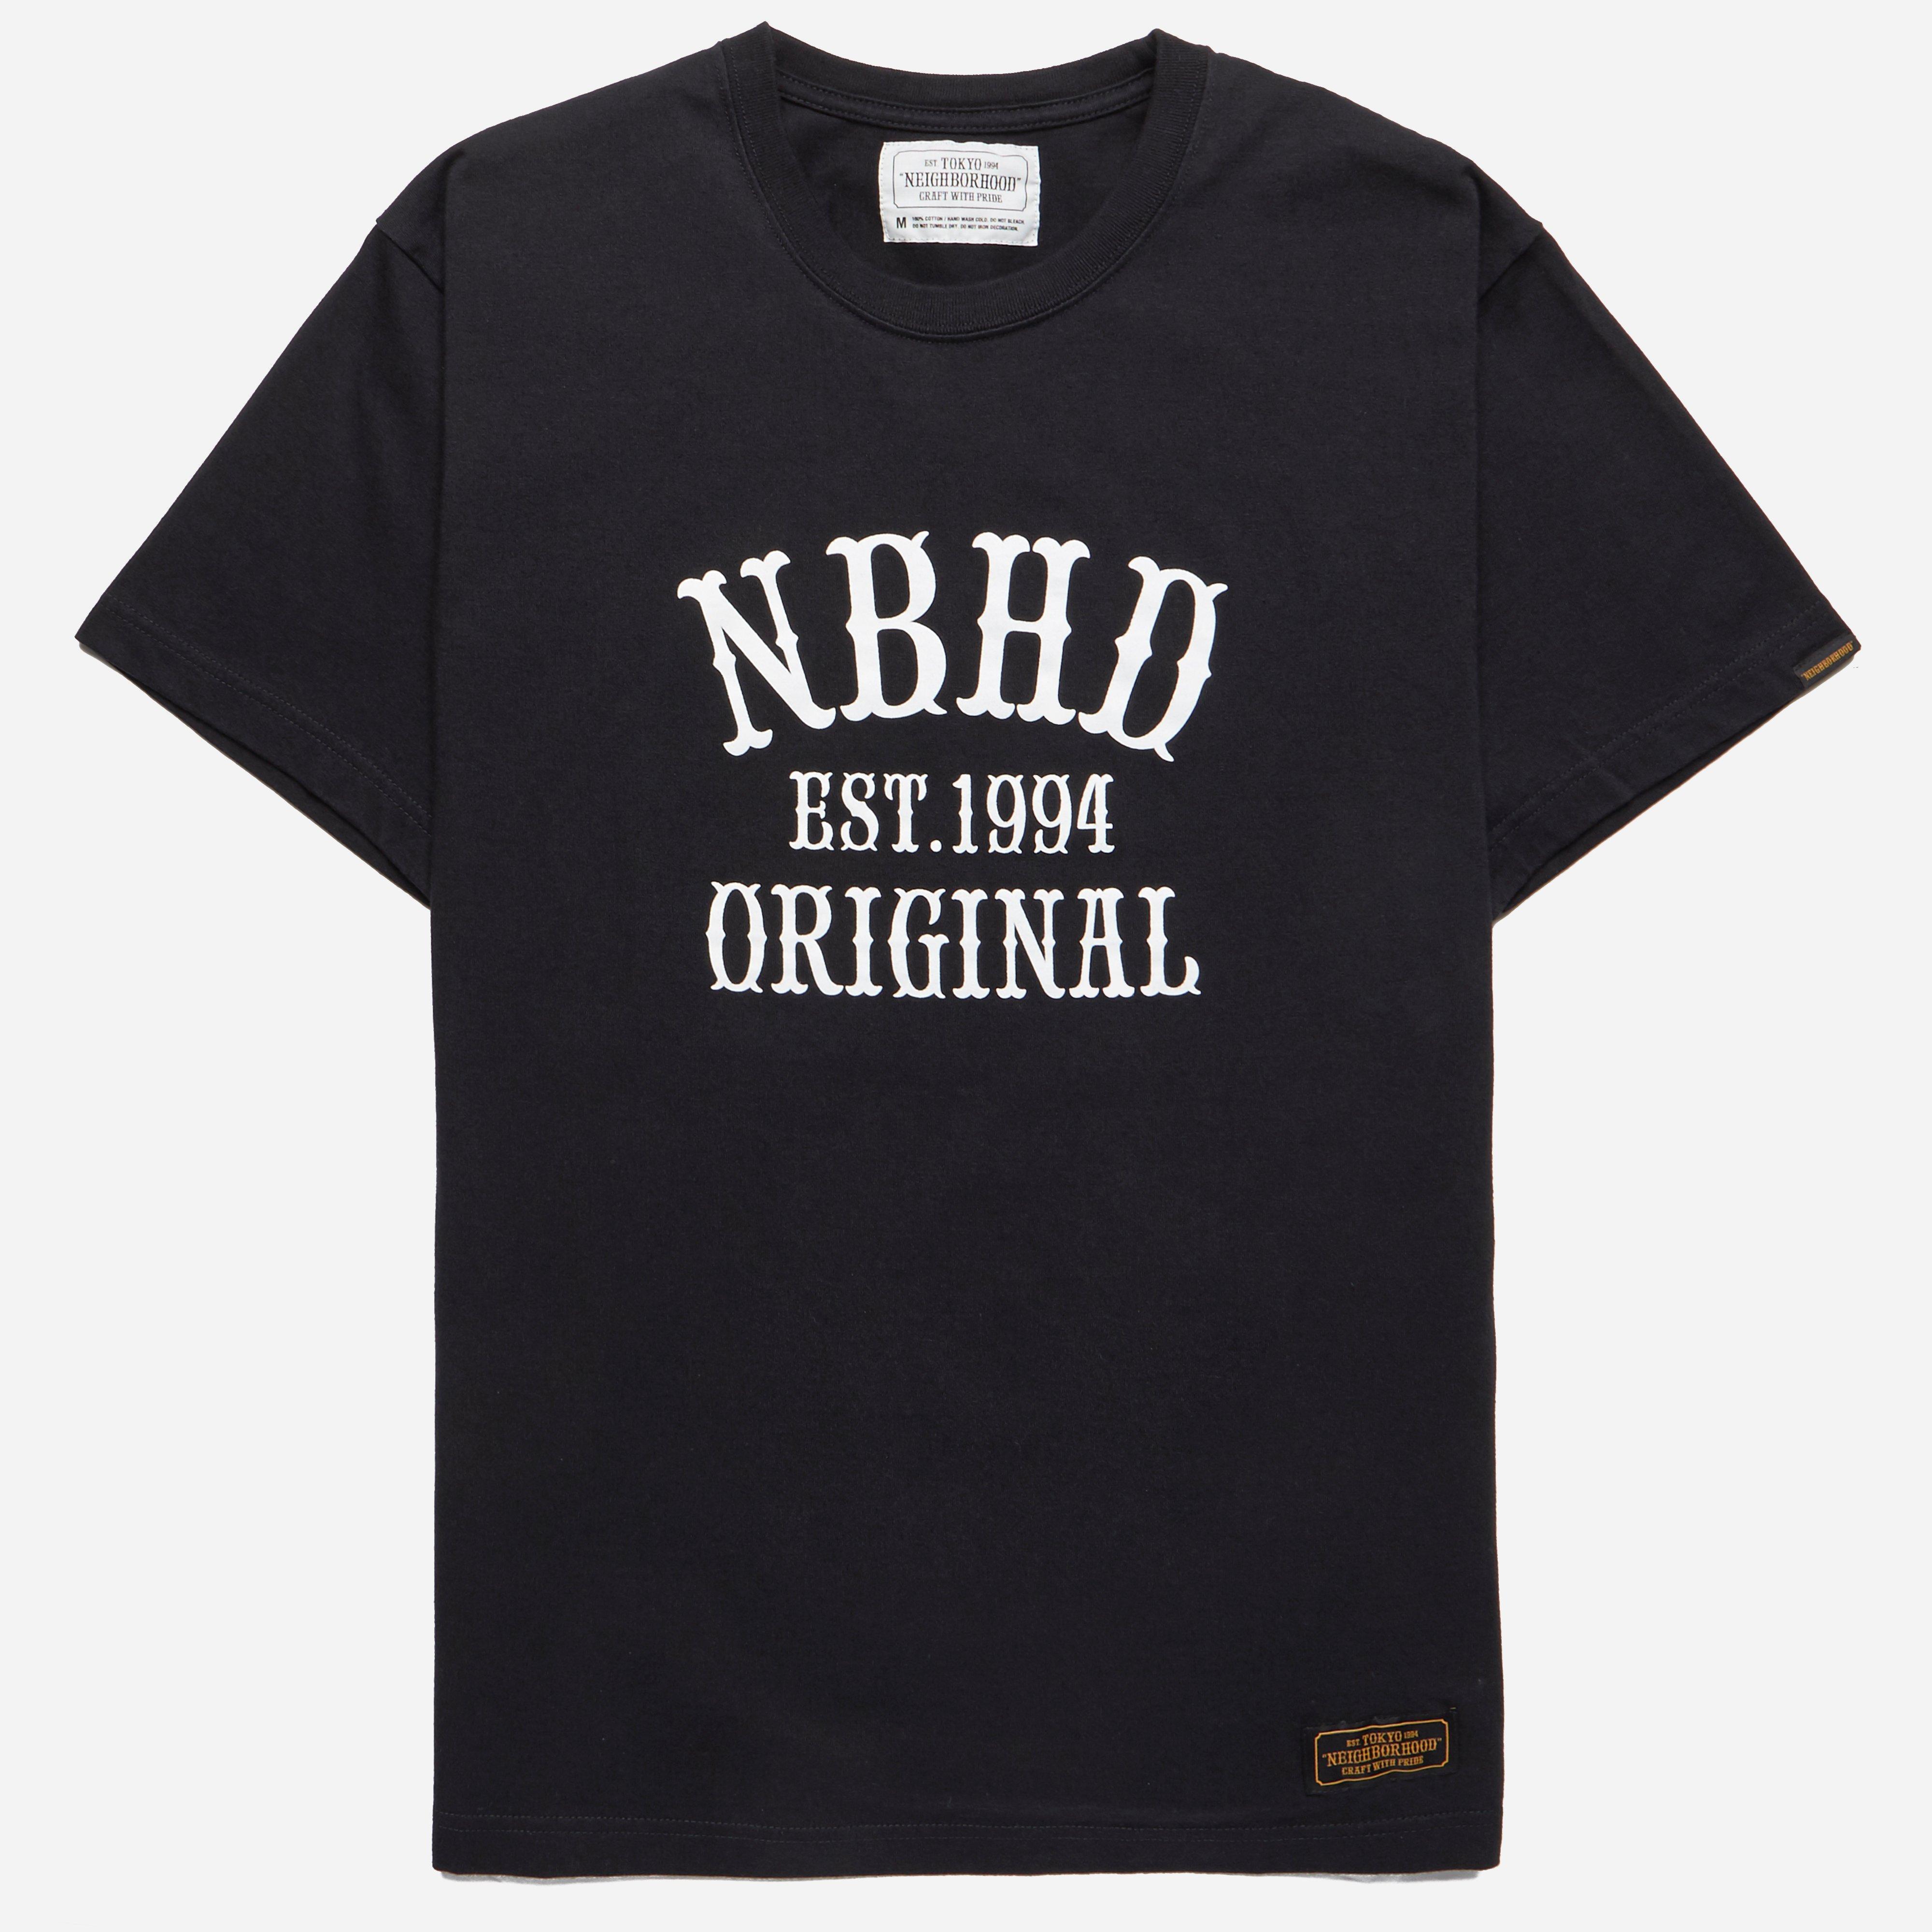 Neighborhood Original C T-shirt